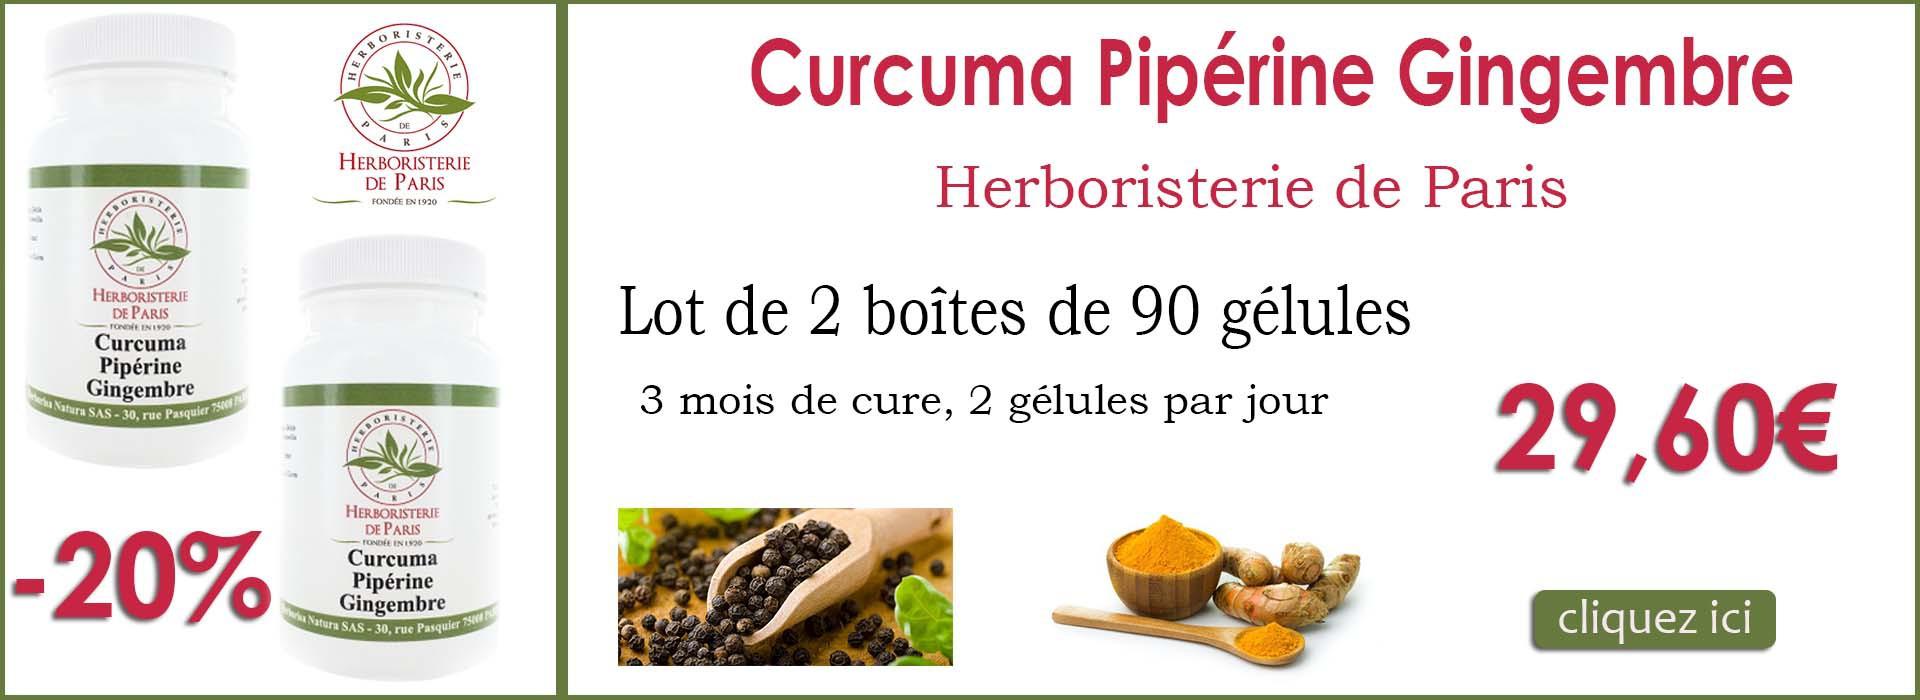 curcuma piperine gingembre herboristerie de paris